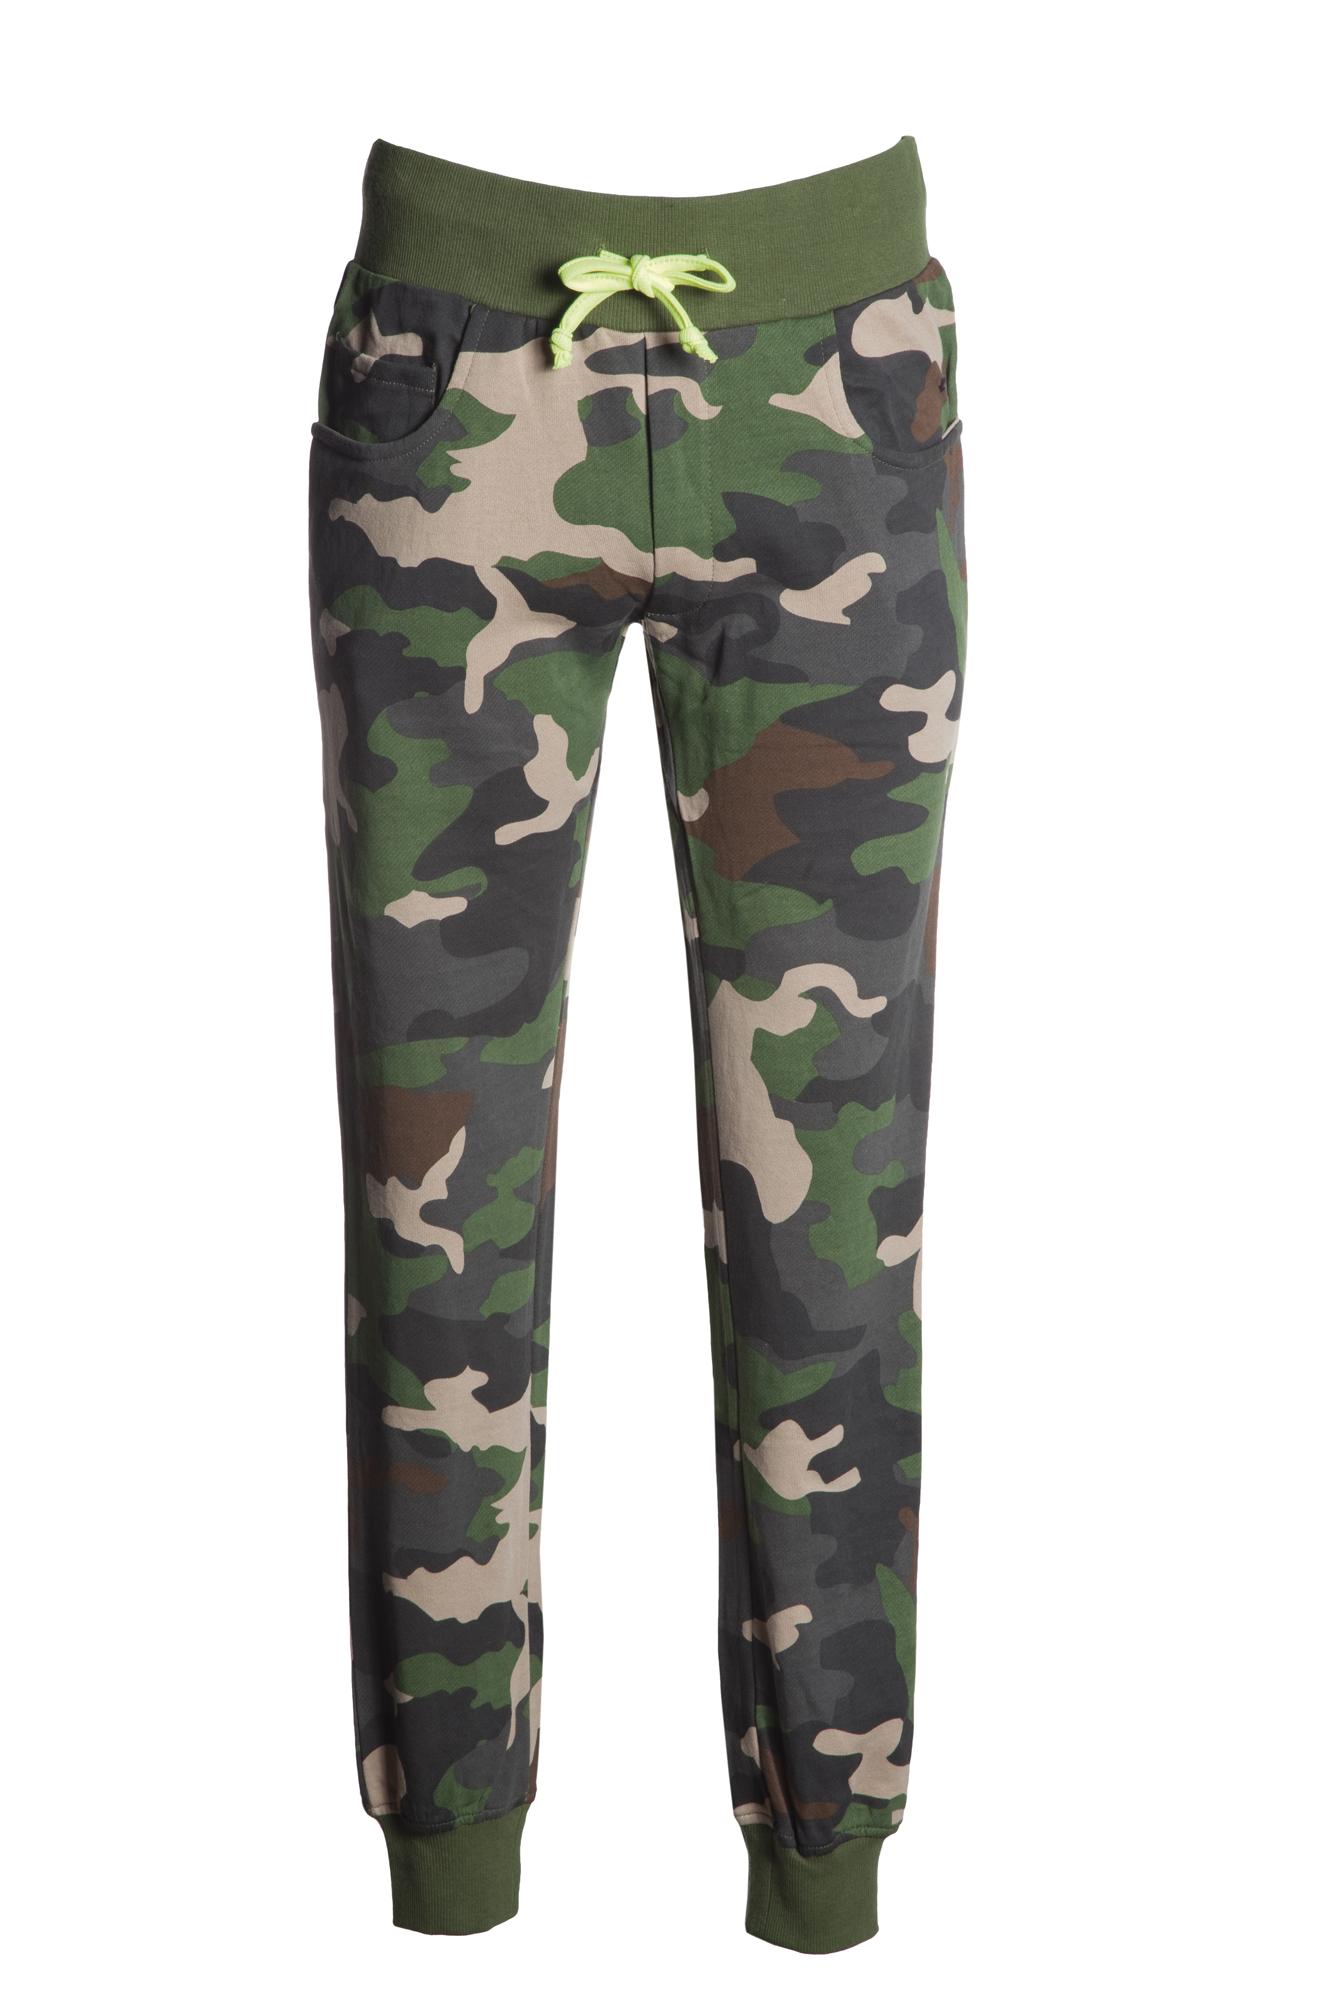 pantalon de sport homme camouflage adisson. Black Bedroom Furniture Sets. Home Design Ideas